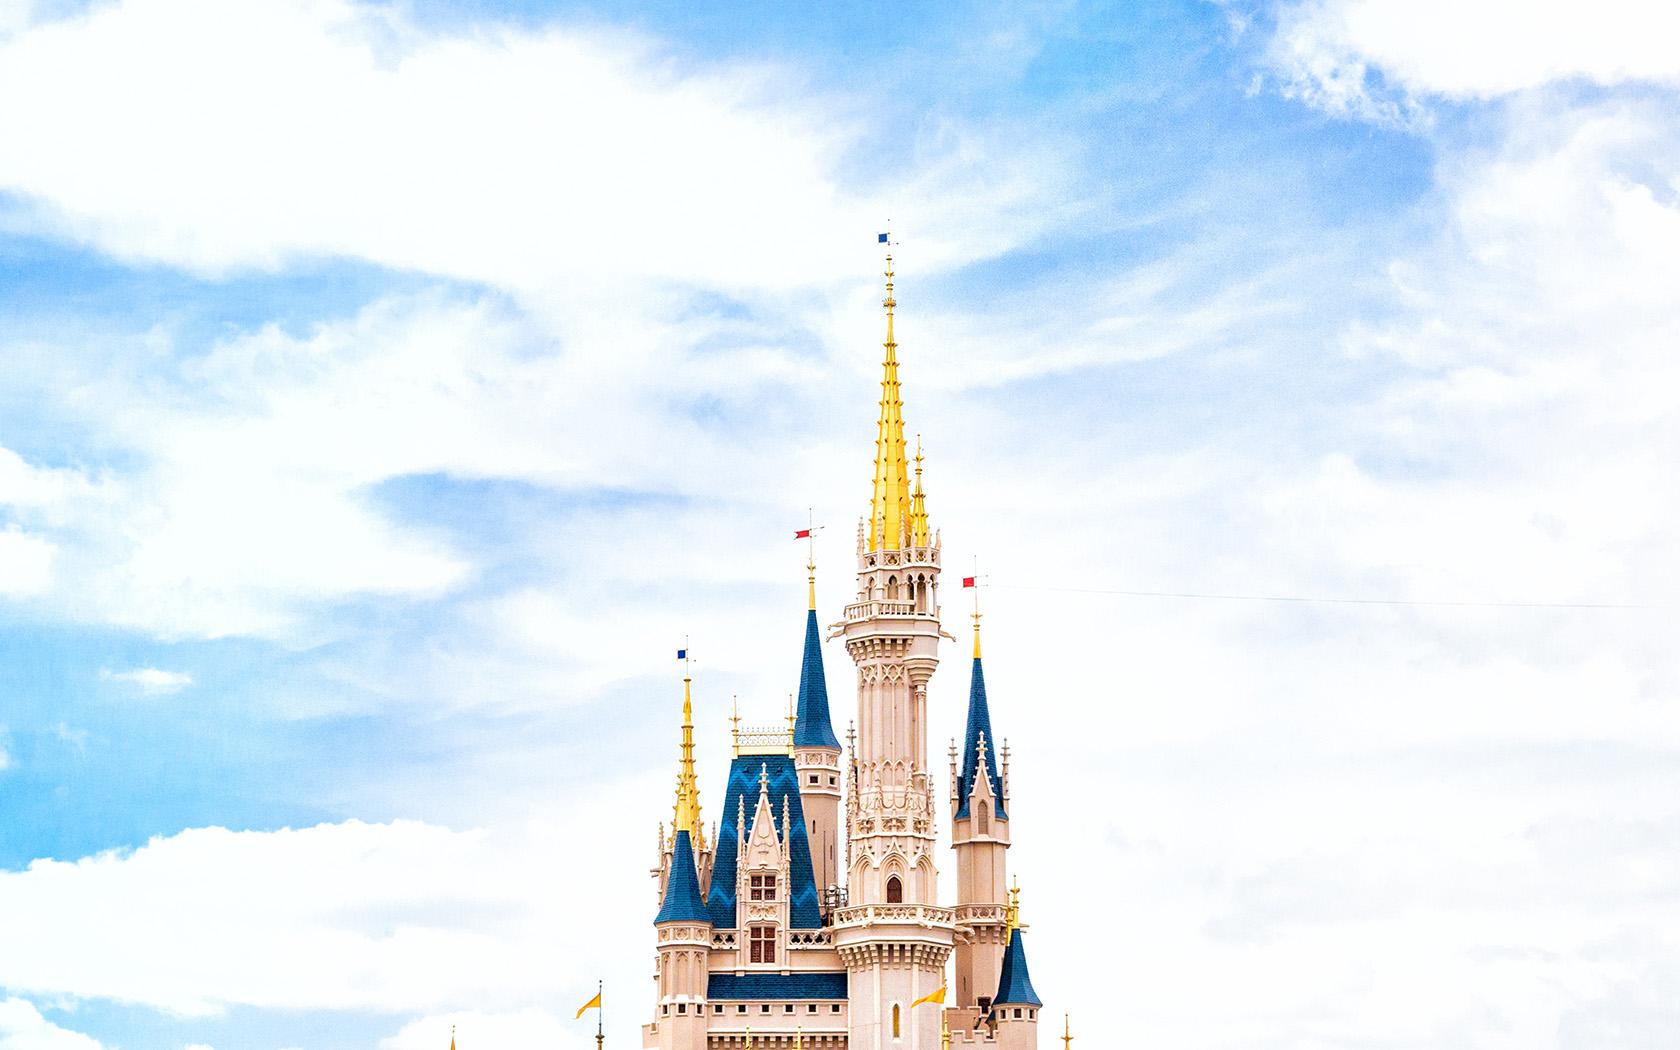 Disney World Fall Wallpaper Nn96 Disney World Castle Sky Wallpaper